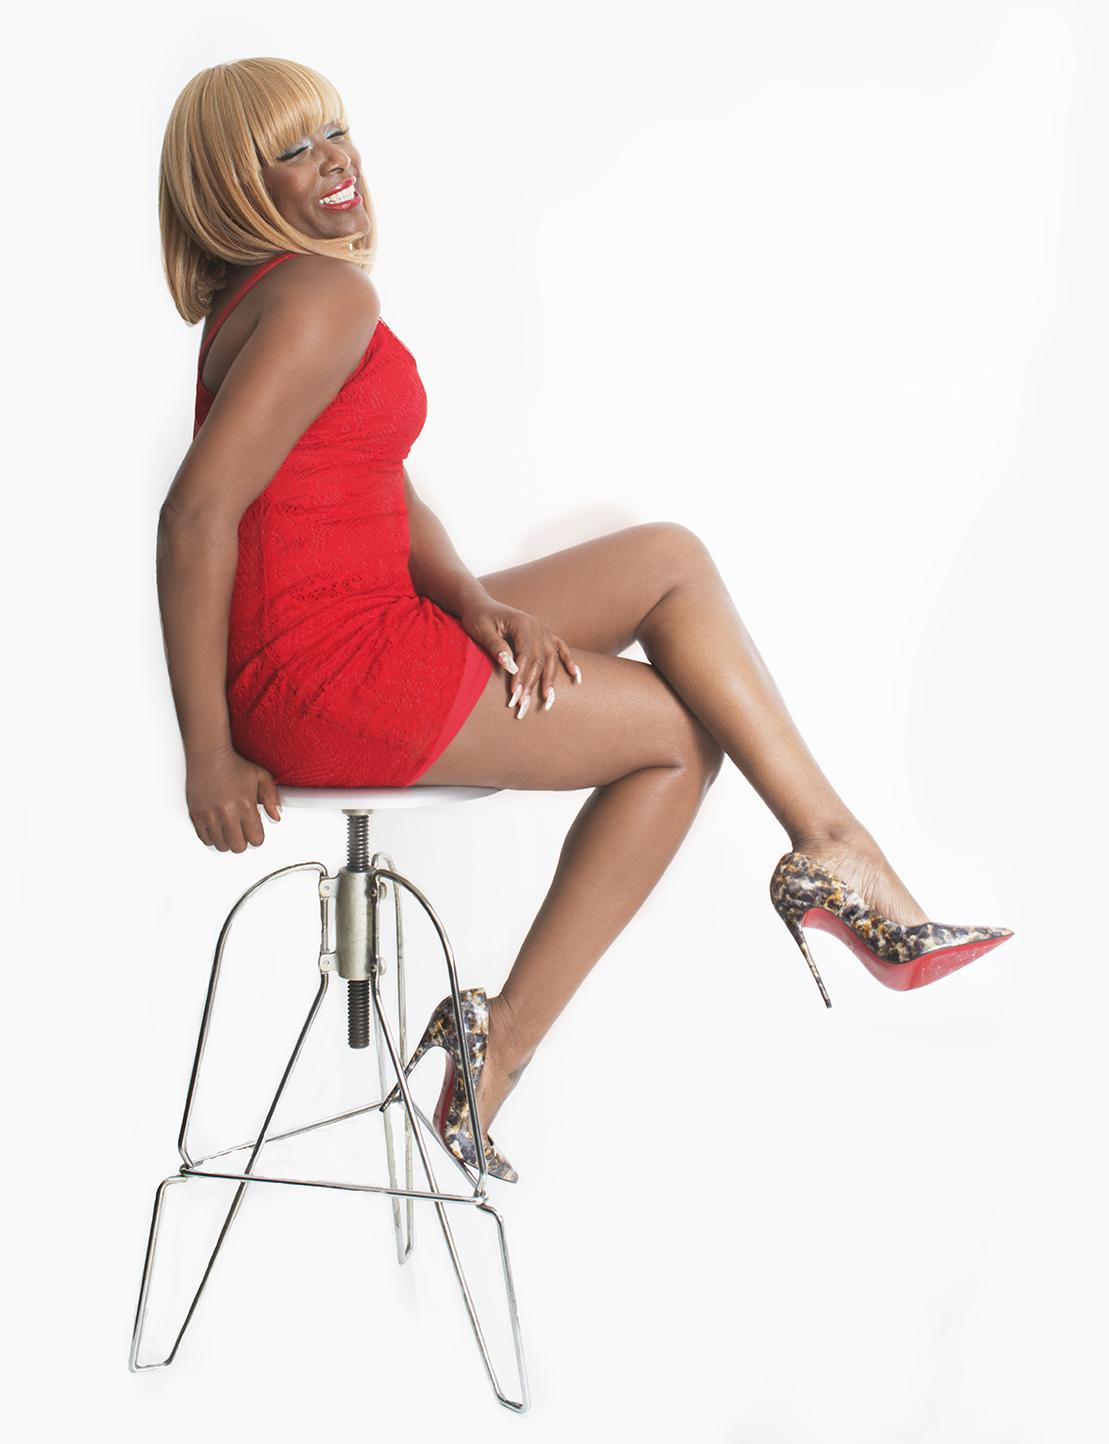 KimberlyDavis_Celebrity_MAY_18_2016_Kimberly_Look119809r SMALLER.png